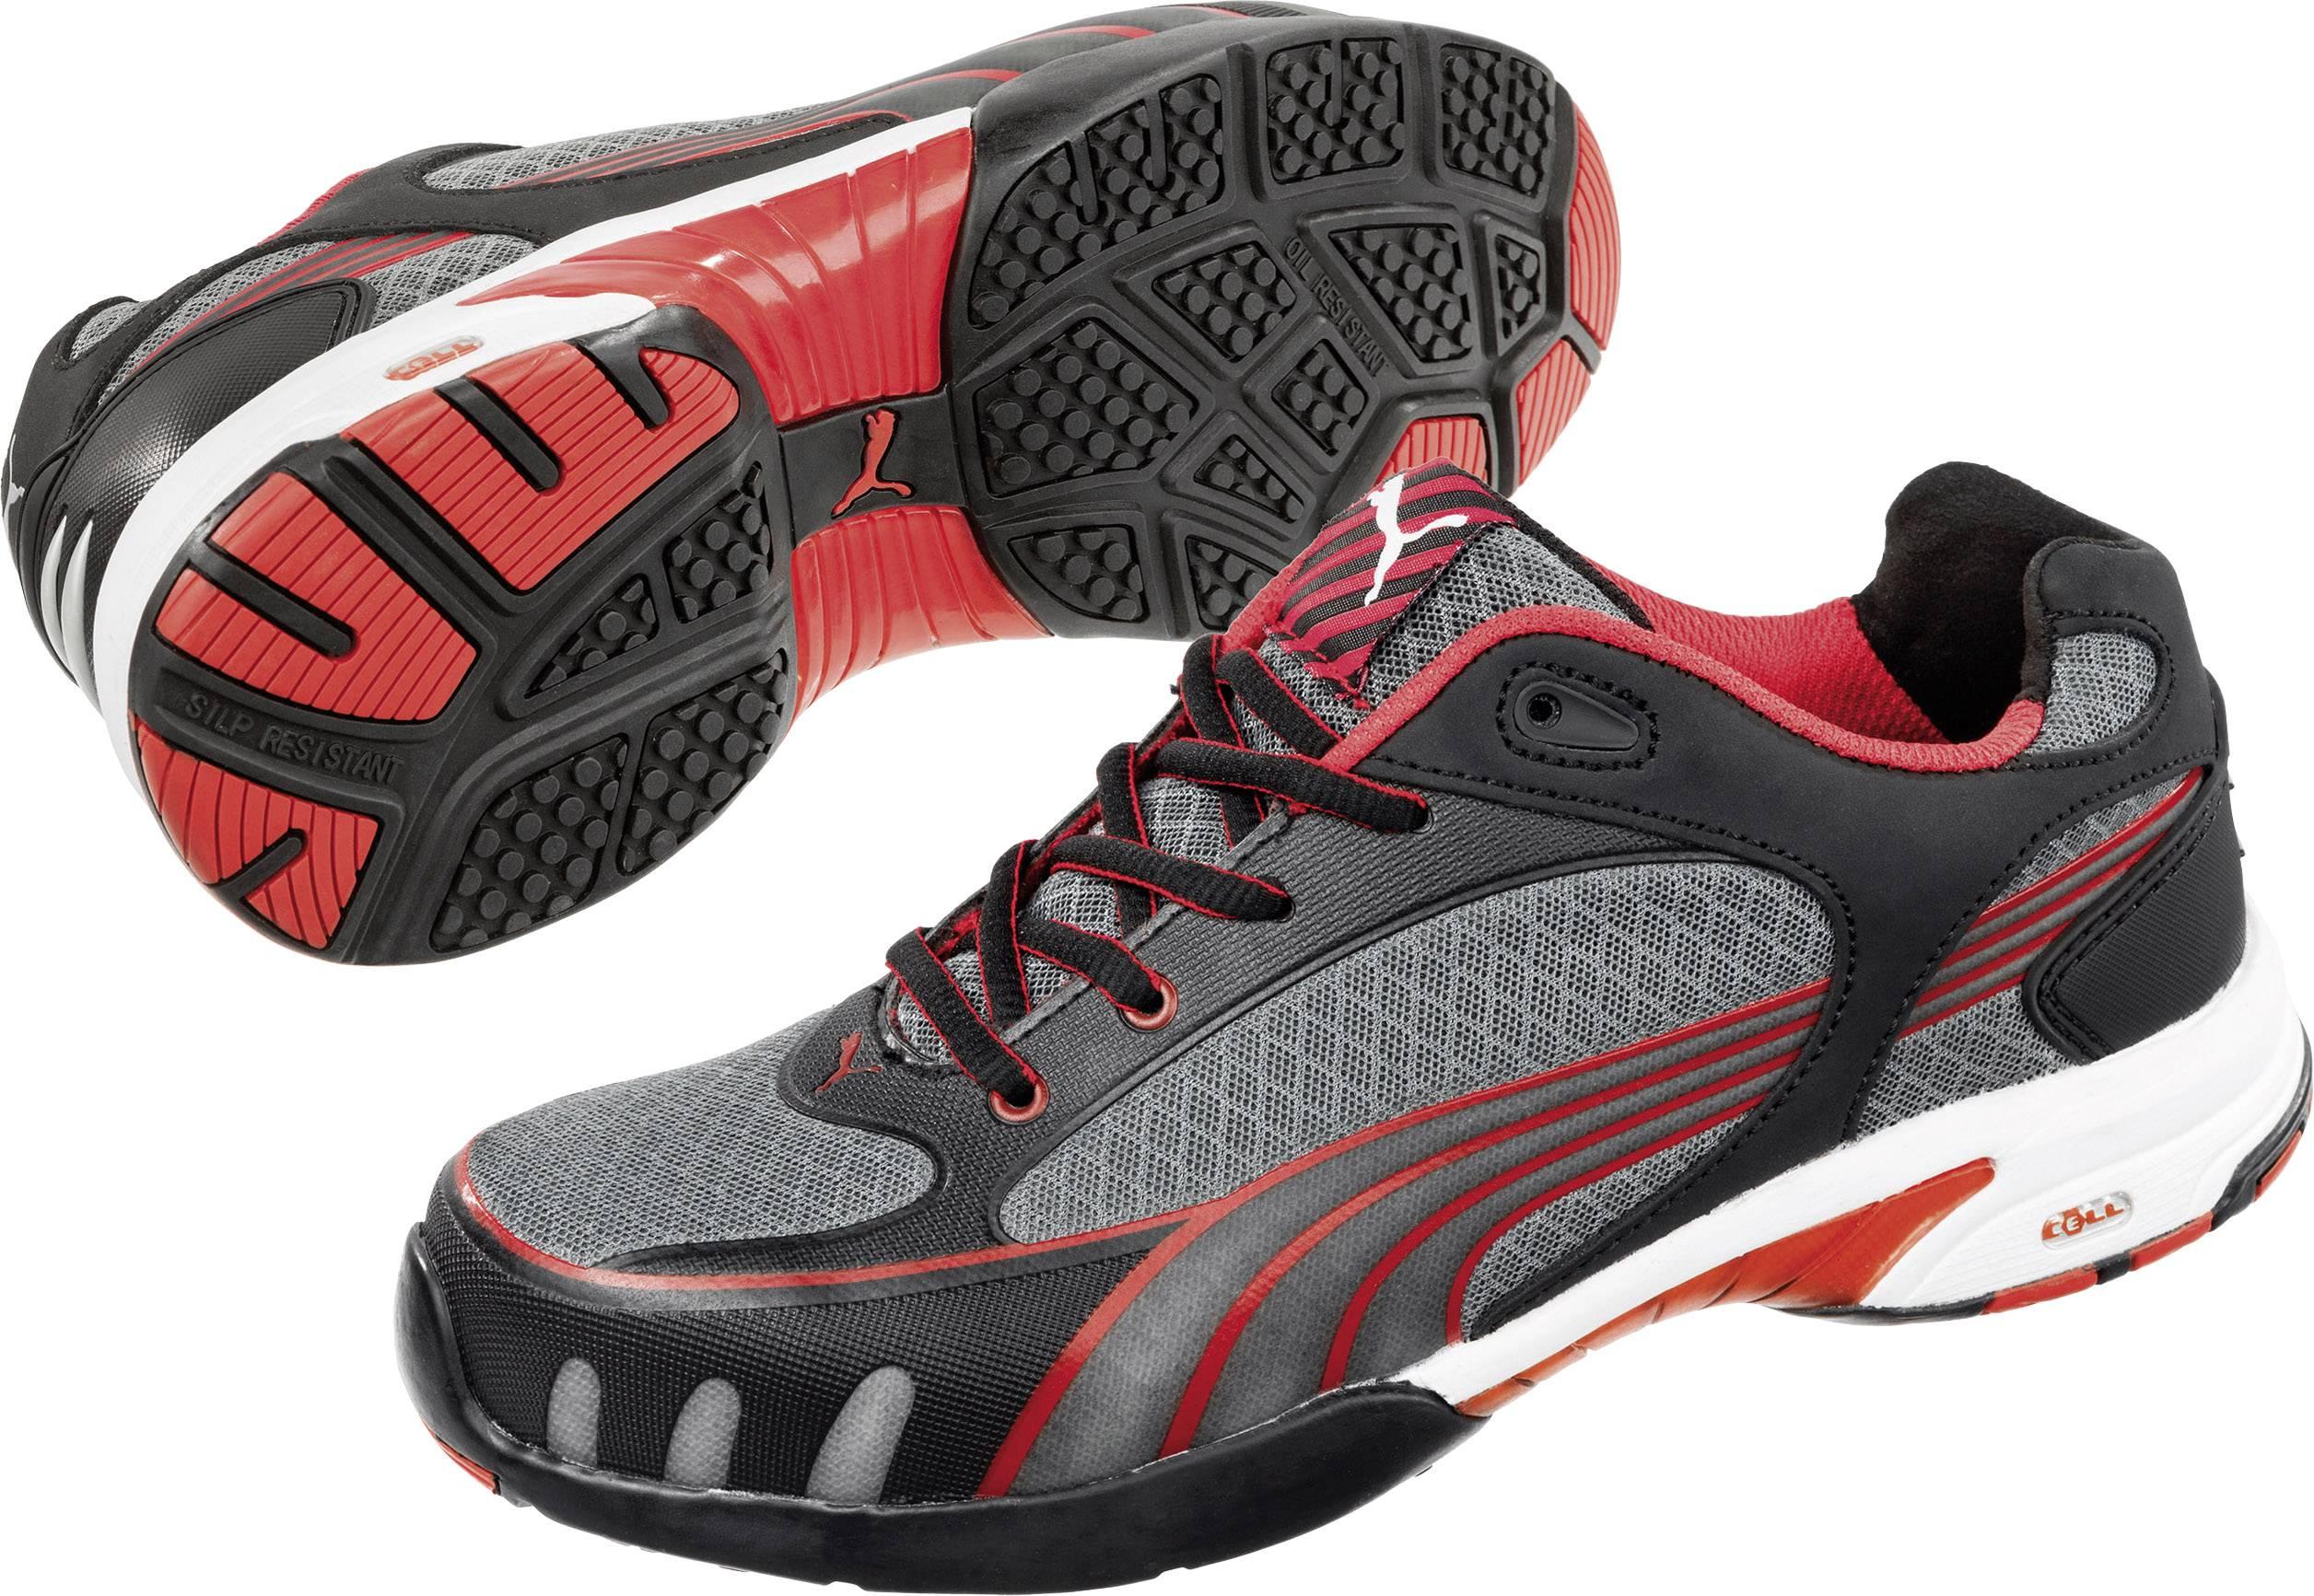 Bezpečnostná obuv S1 PUMA Safety Fuse Motion Red Wns Low 642870, veľ.: 39, čierna, červená, 1 pár